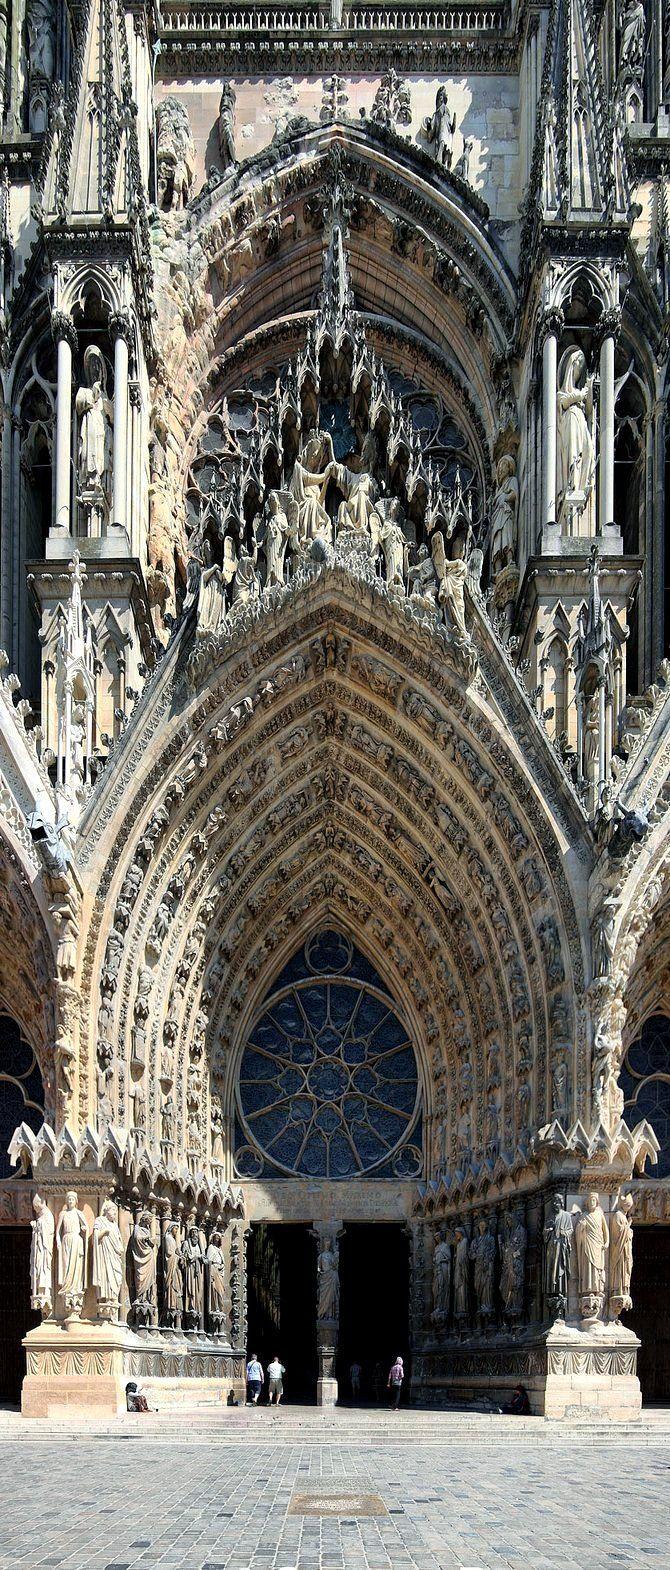 Cathédrale Notre-Dame de Reims, Champagne-Ardenne, France | Flickr - Photo by Batistini Gaston